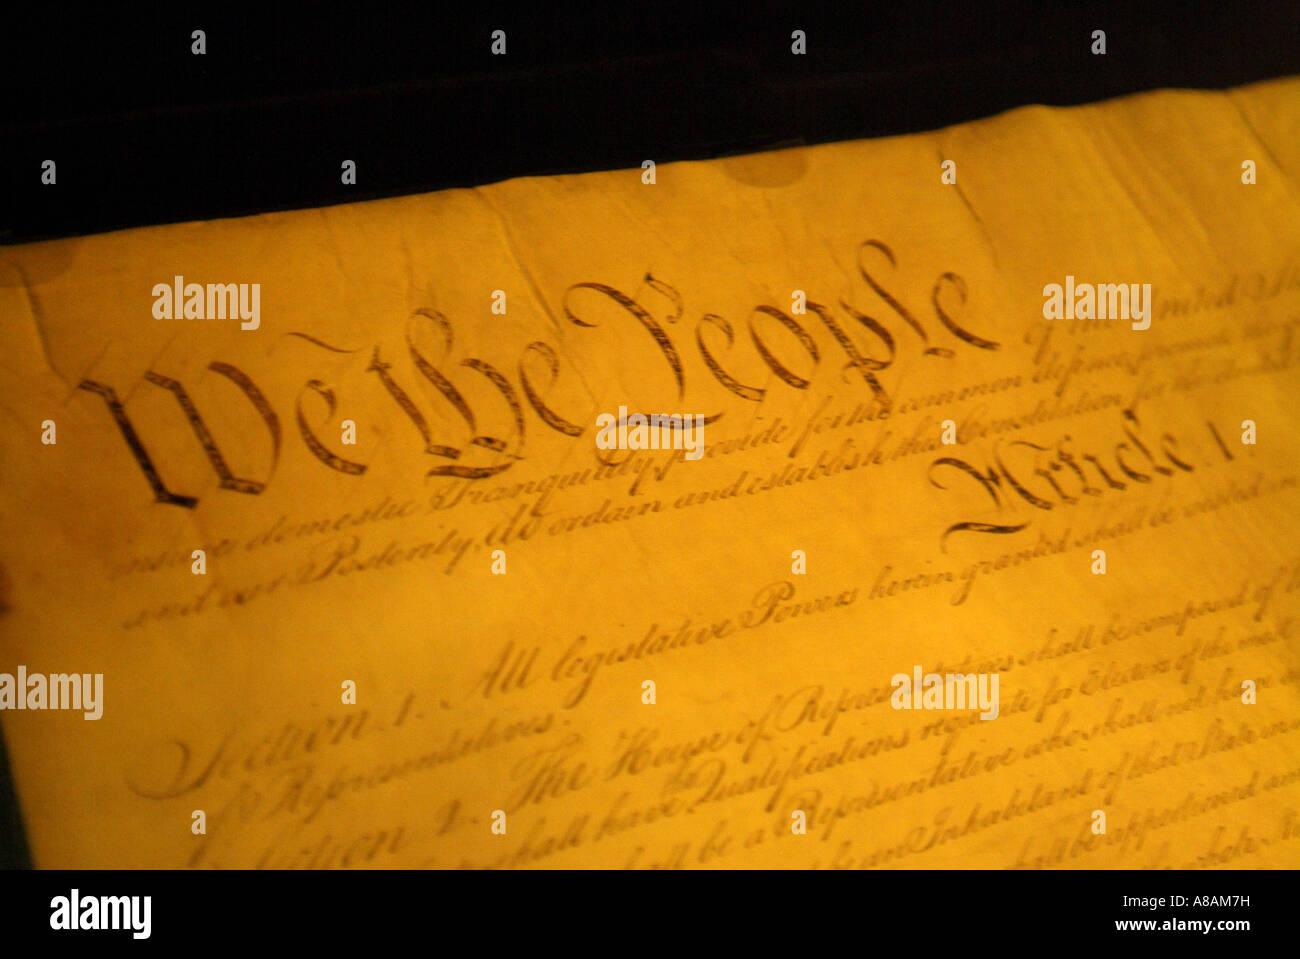 USA Washington DC The National Archives Rotunda Constitution - Stock Image